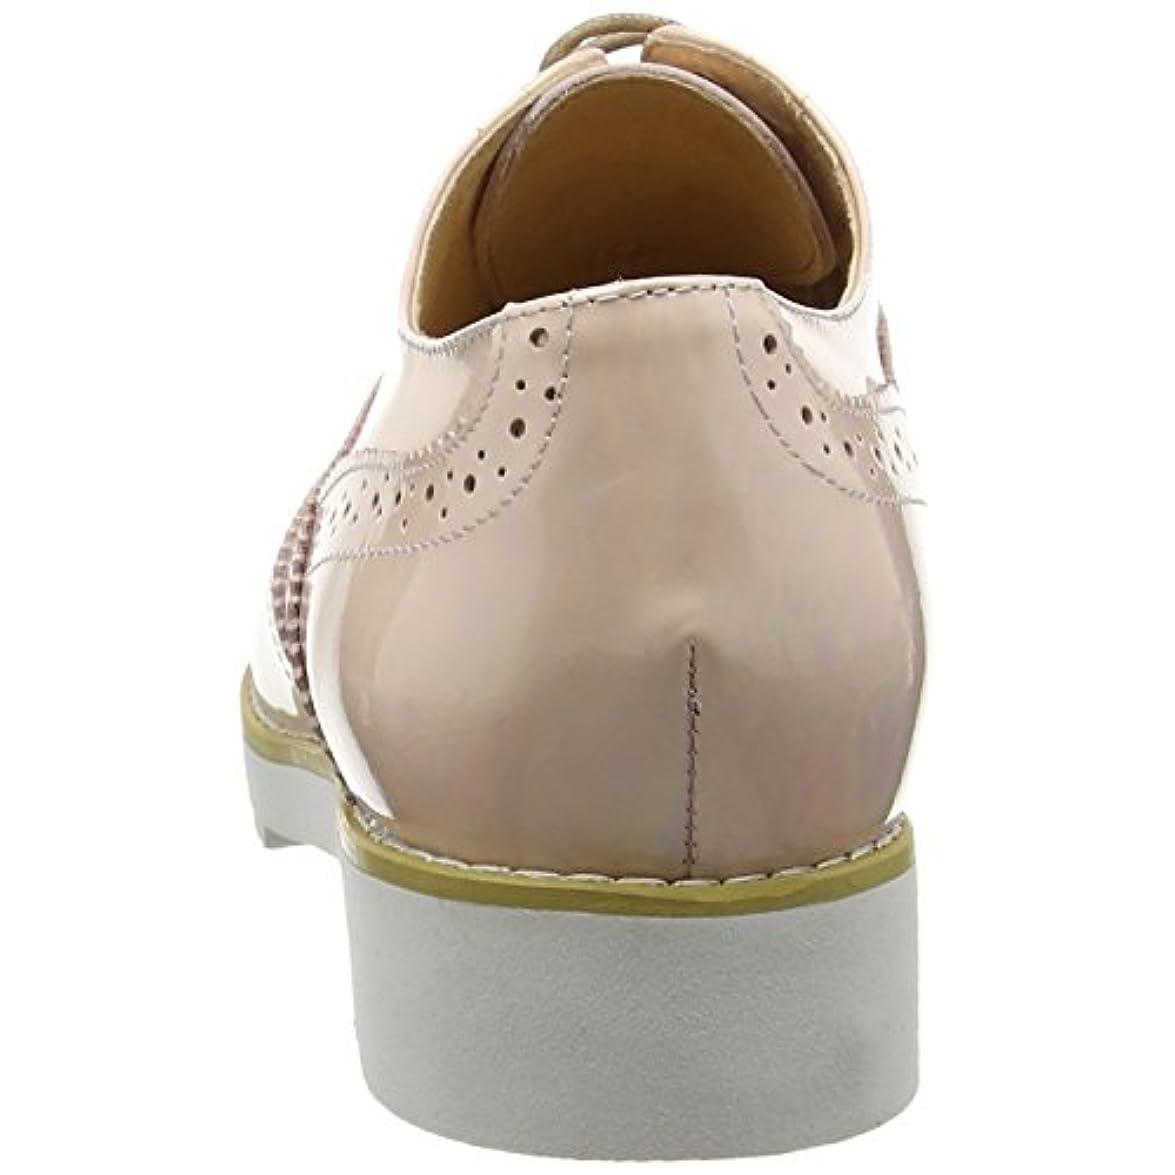 Giudecca - Jycx15pr2-1 Scarpe Stringate Donna